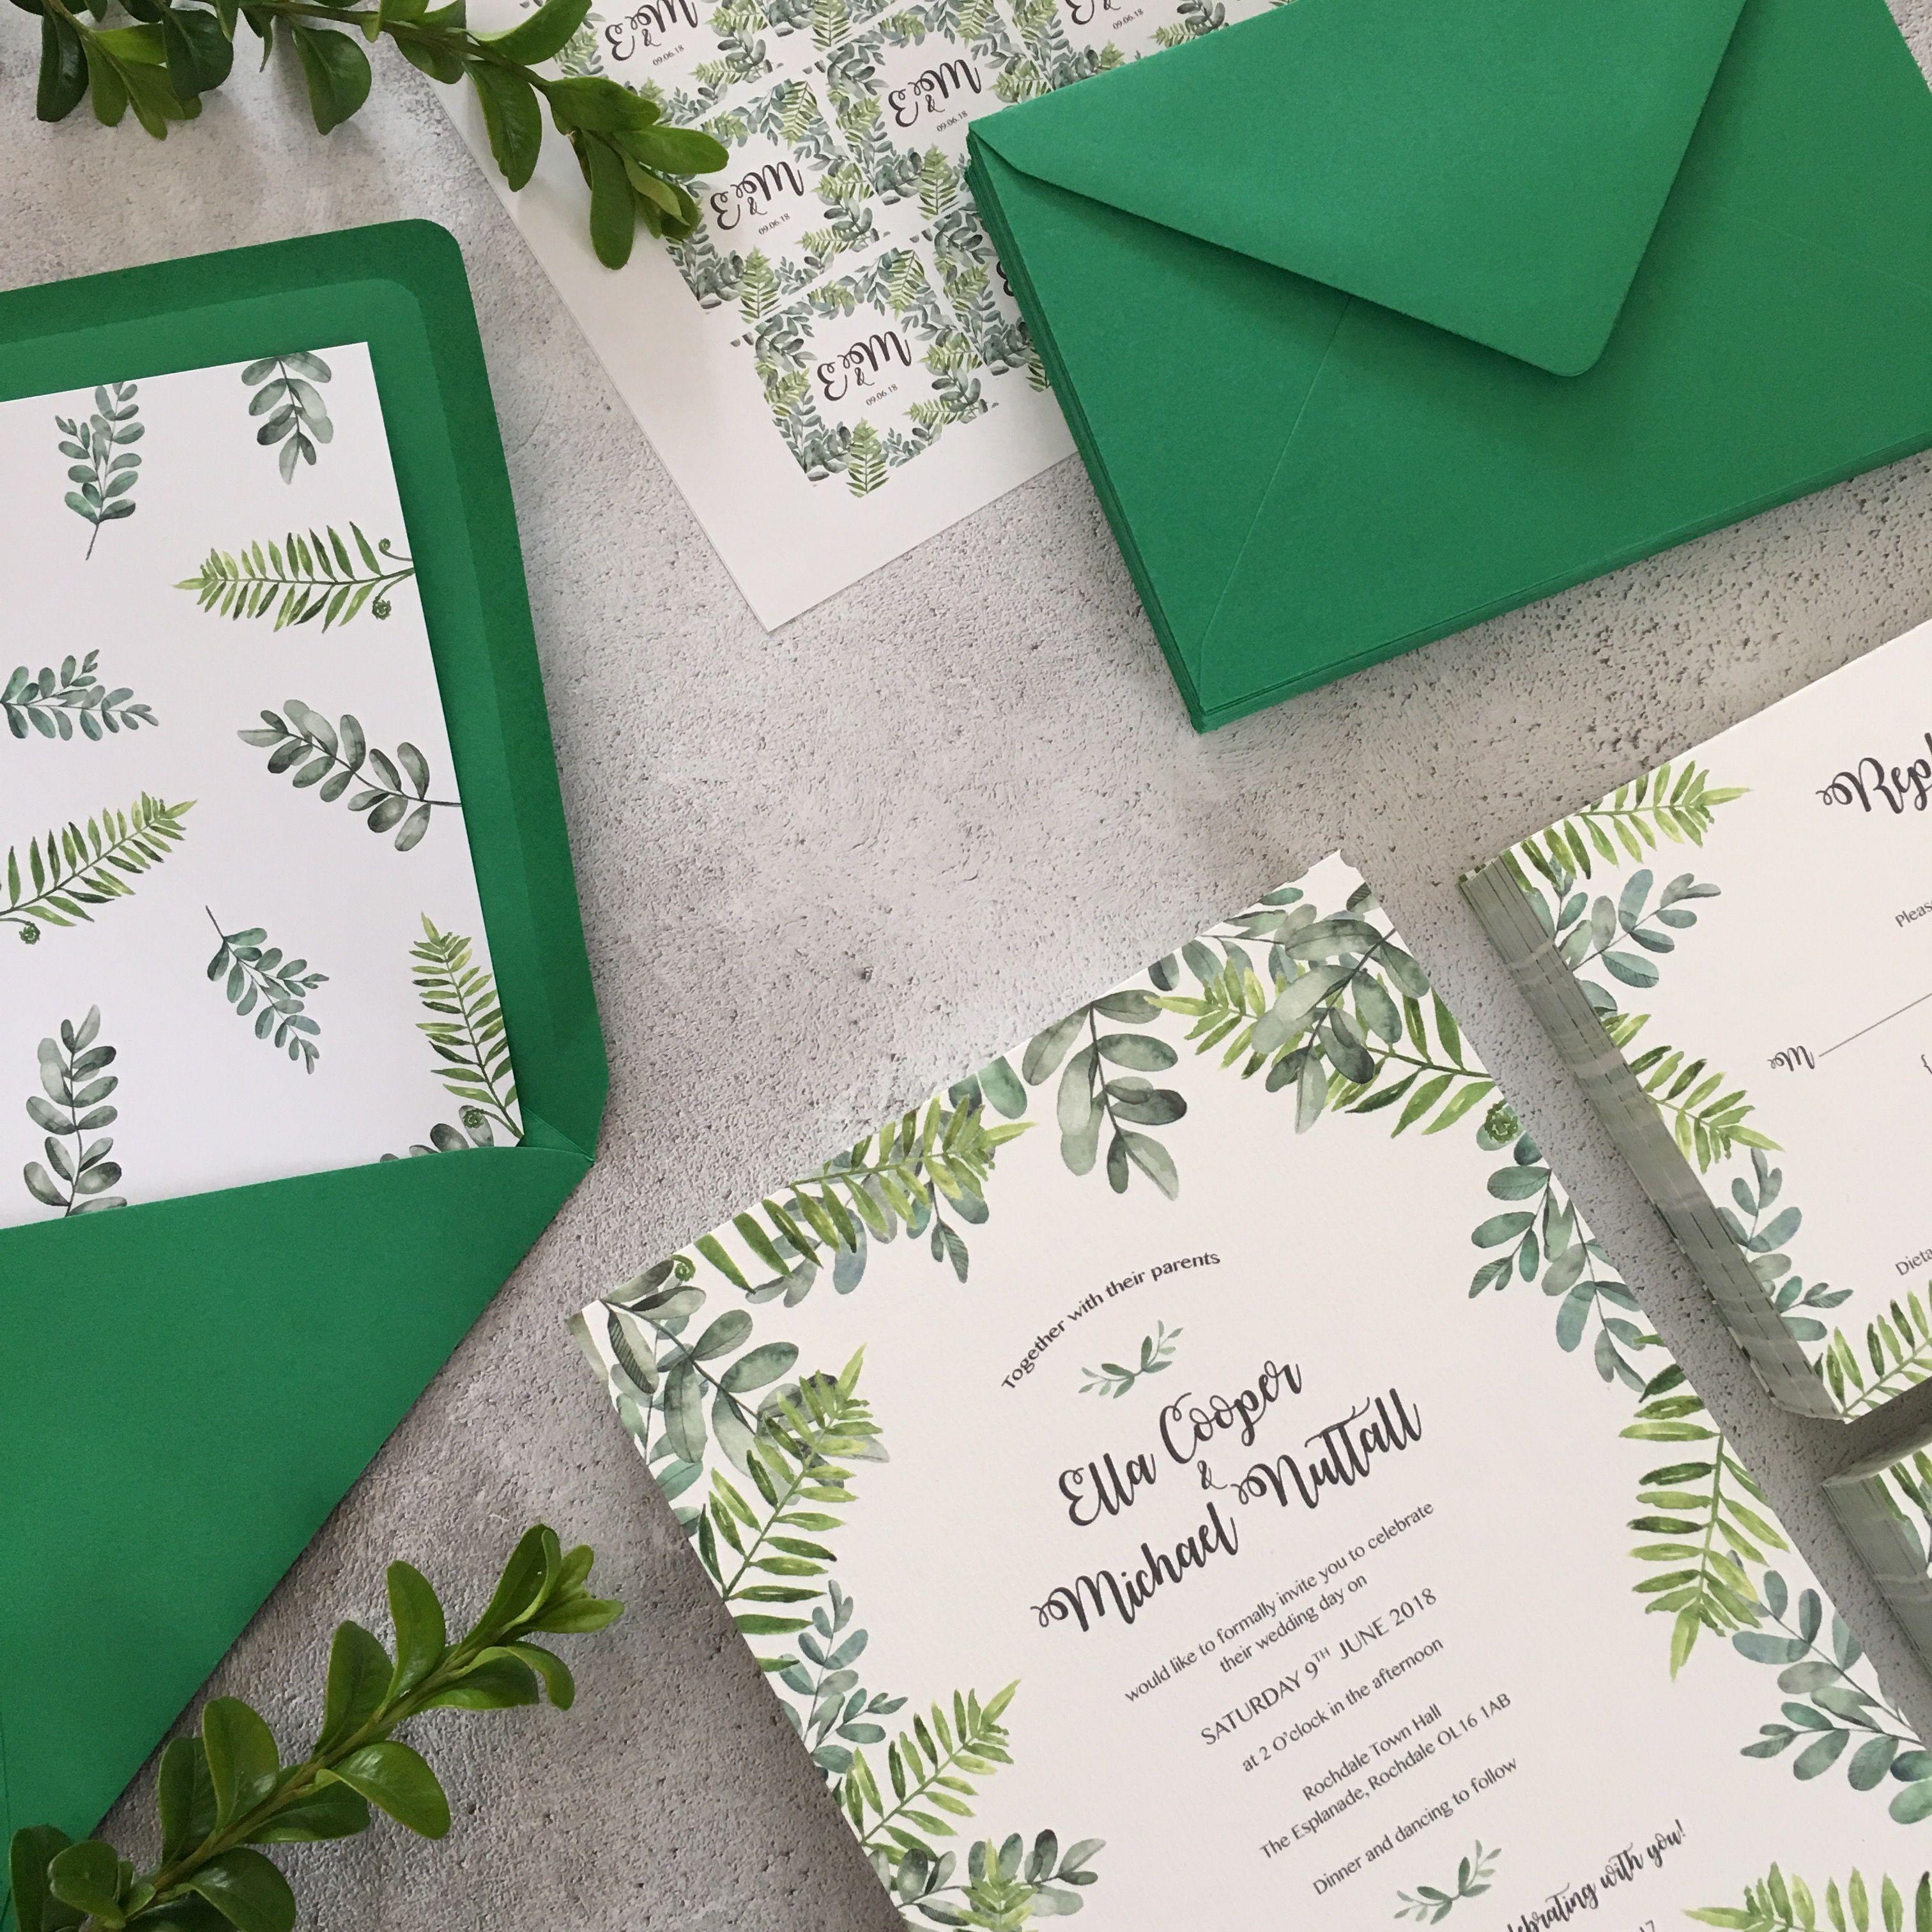 Green botanical wedding invitation design complete with envelopes ...